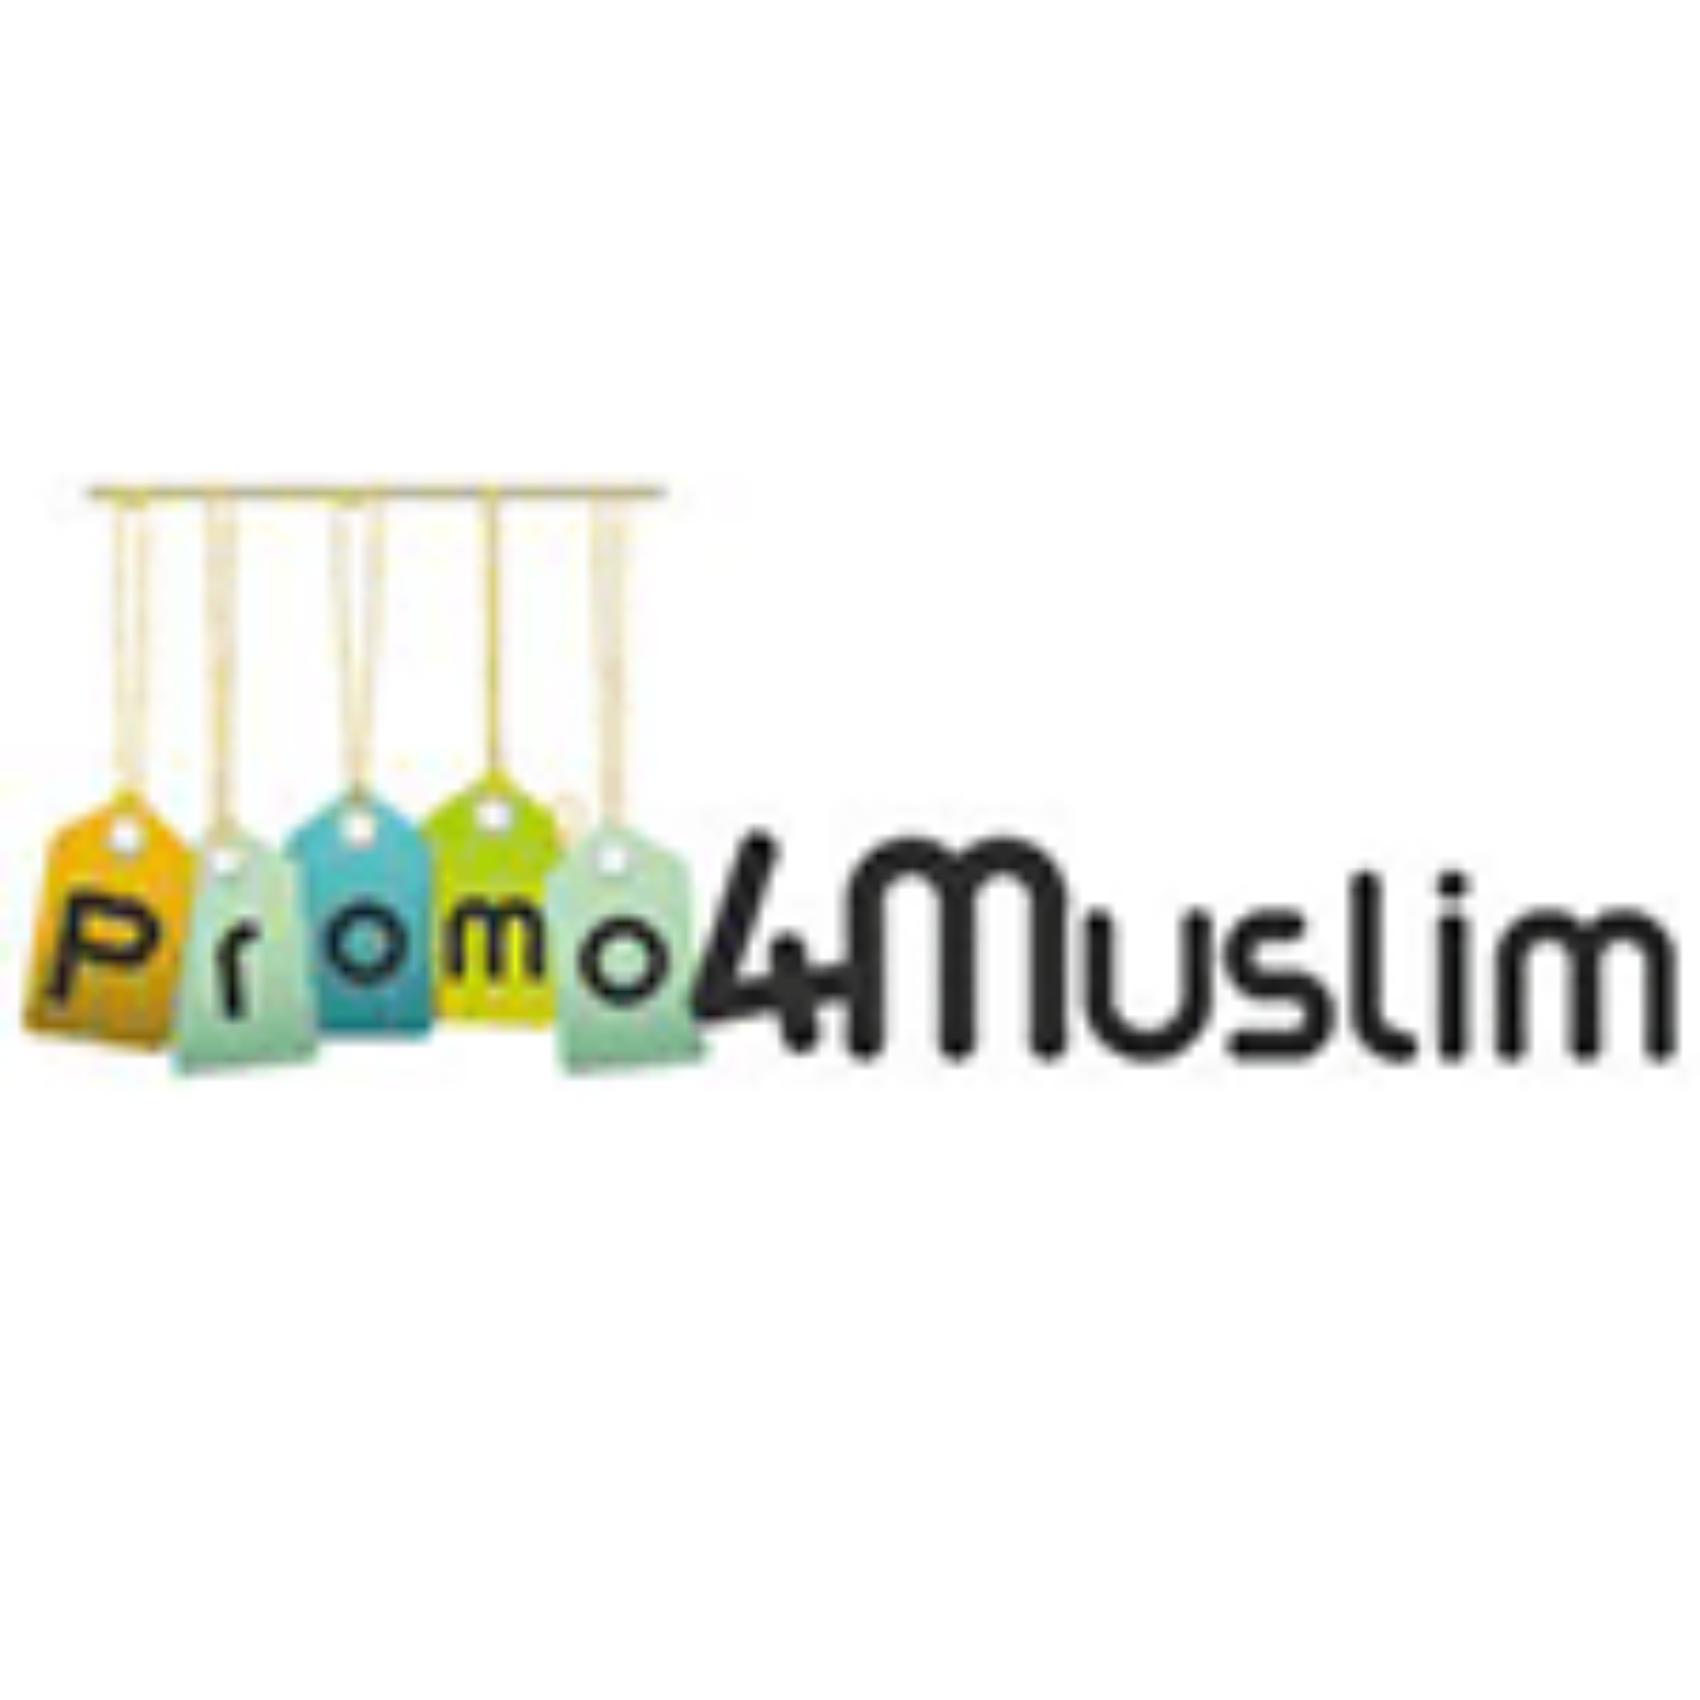 Promo4muslim-min